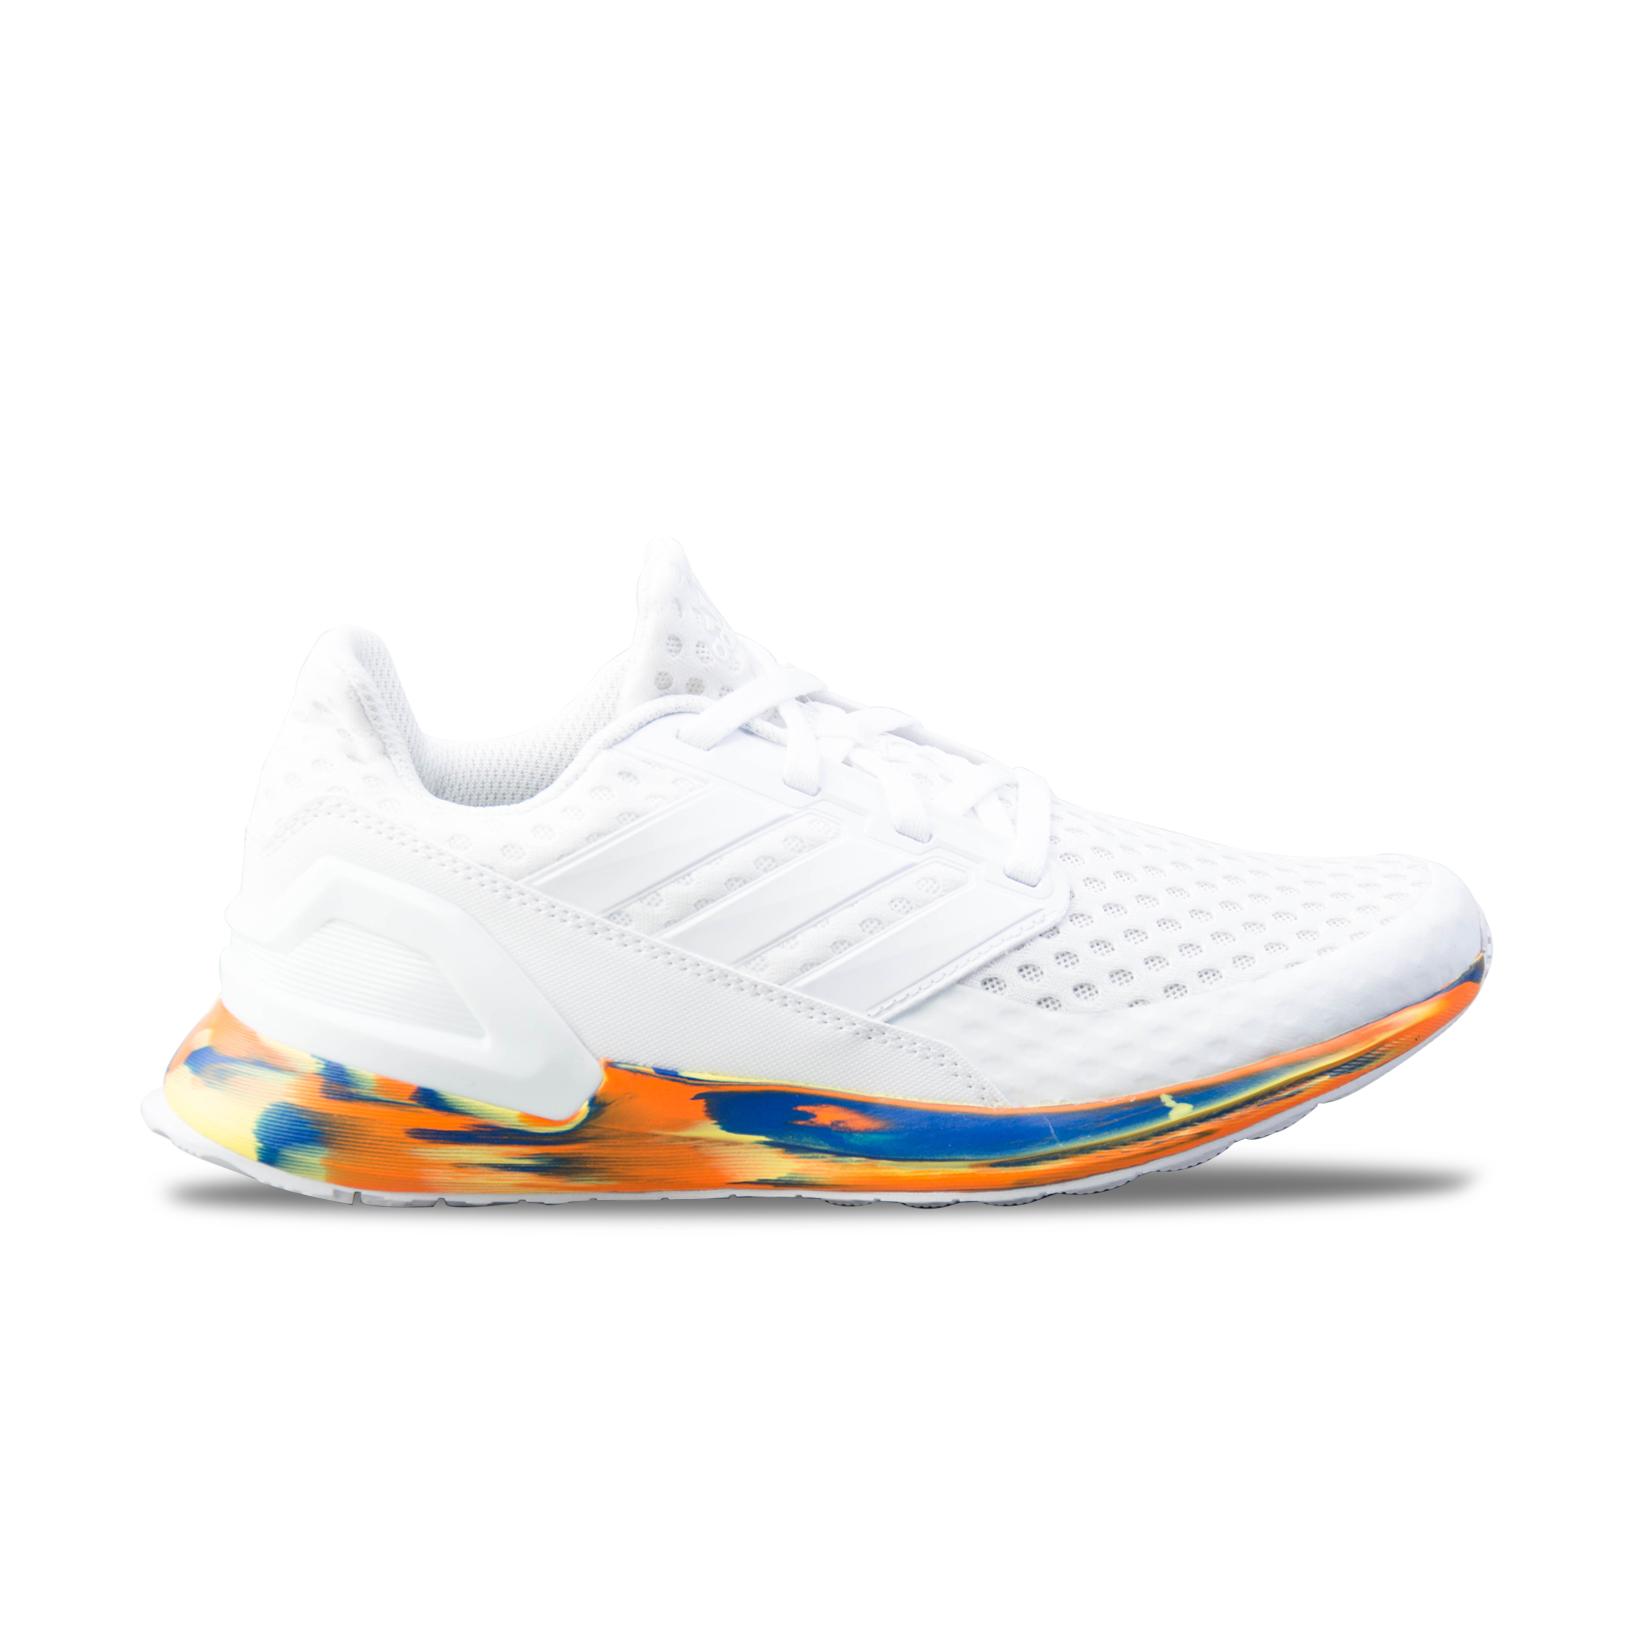 Adidas RapidaRun Foundation J White